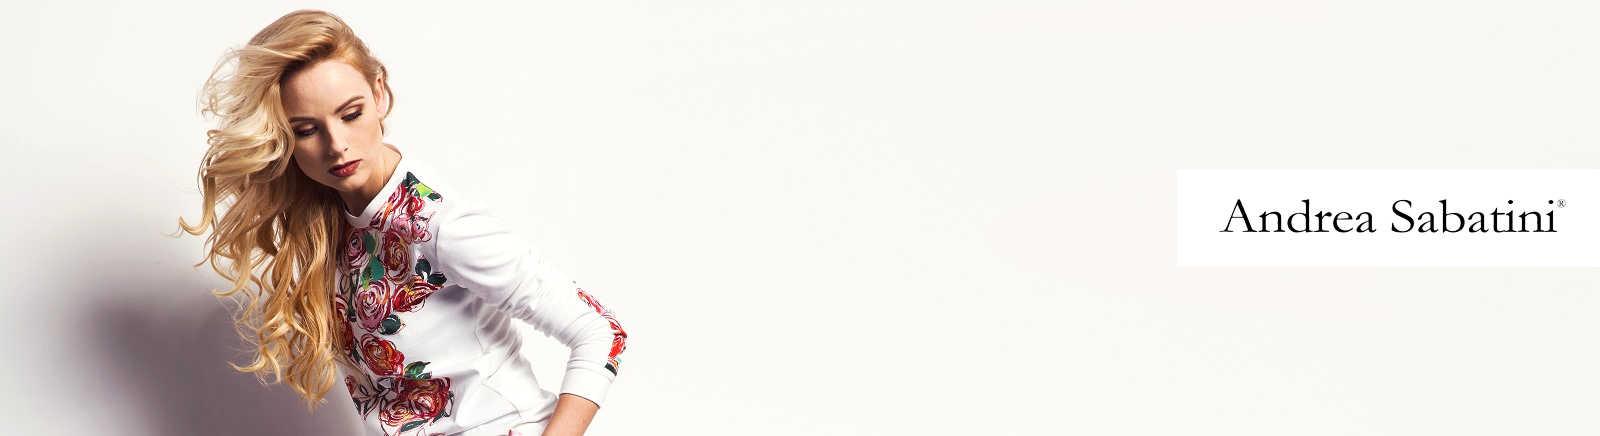 Andrea Sabatini Damenschuhe online entdecken im Juppen Shop